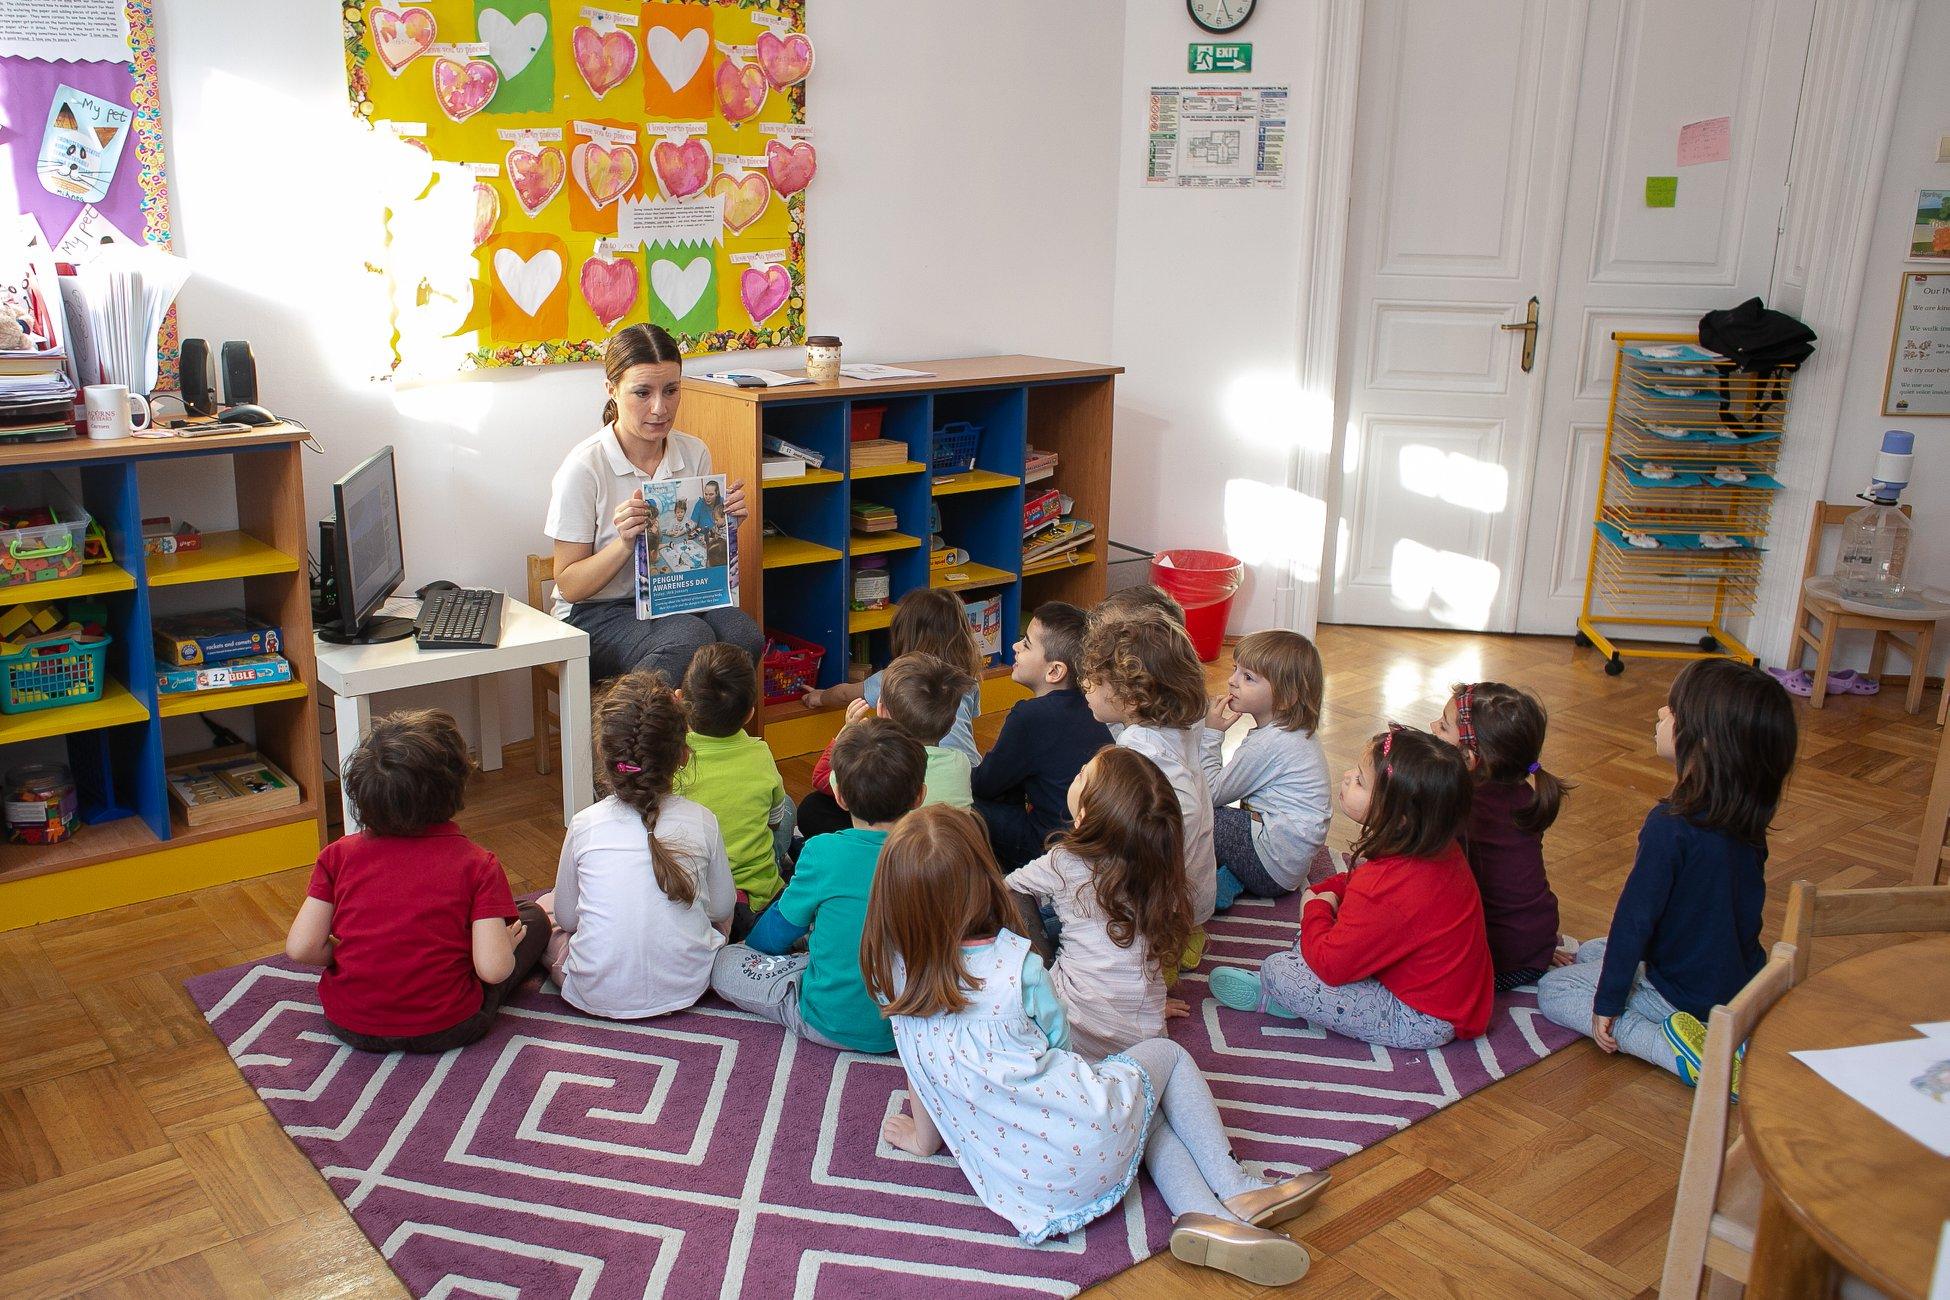 copiii și rasismul